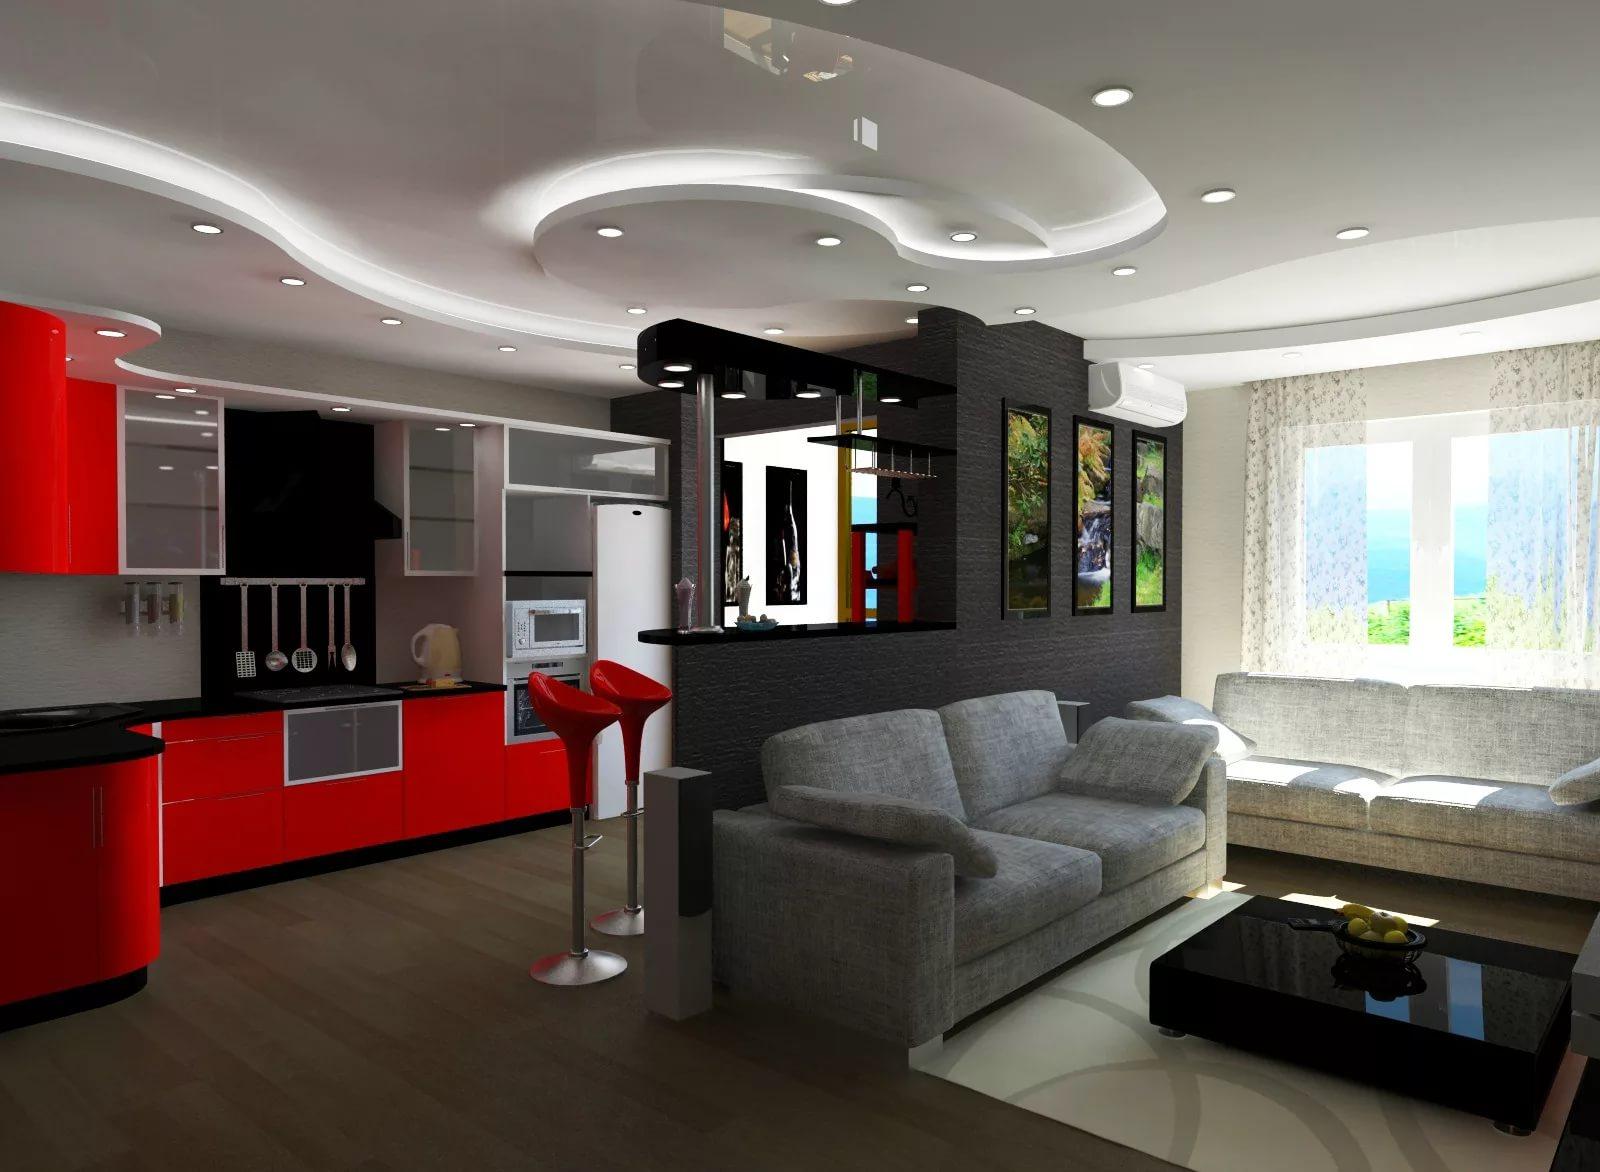 Шкафы на кухне в квартире студии